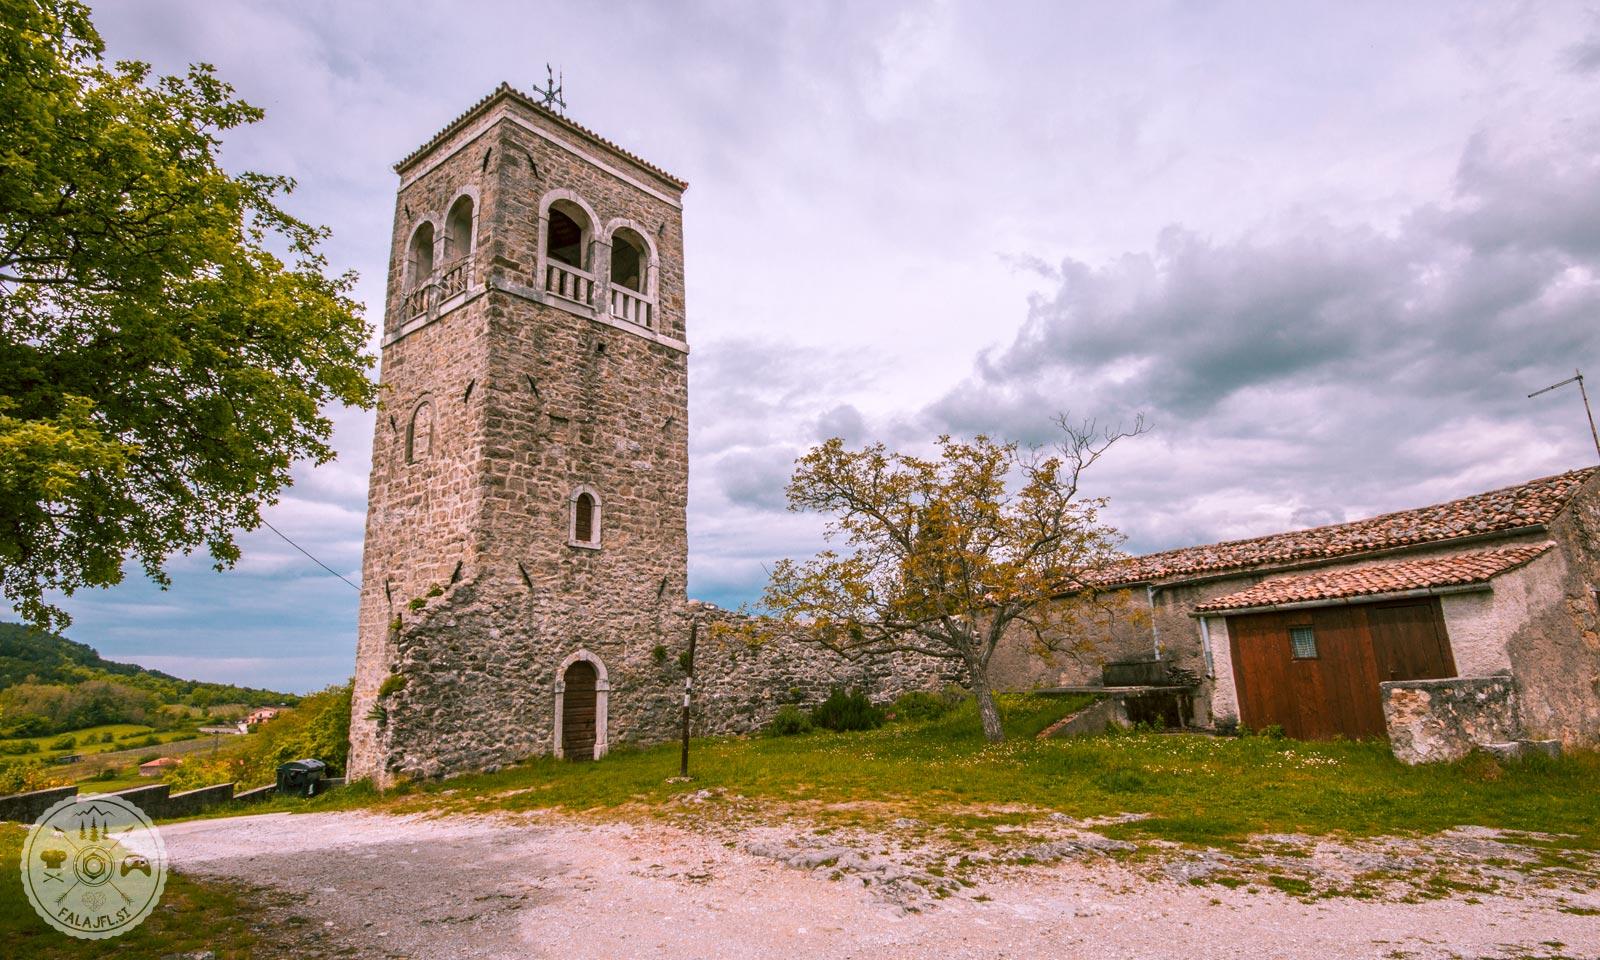 obrambni-stolp-kubed-foto06